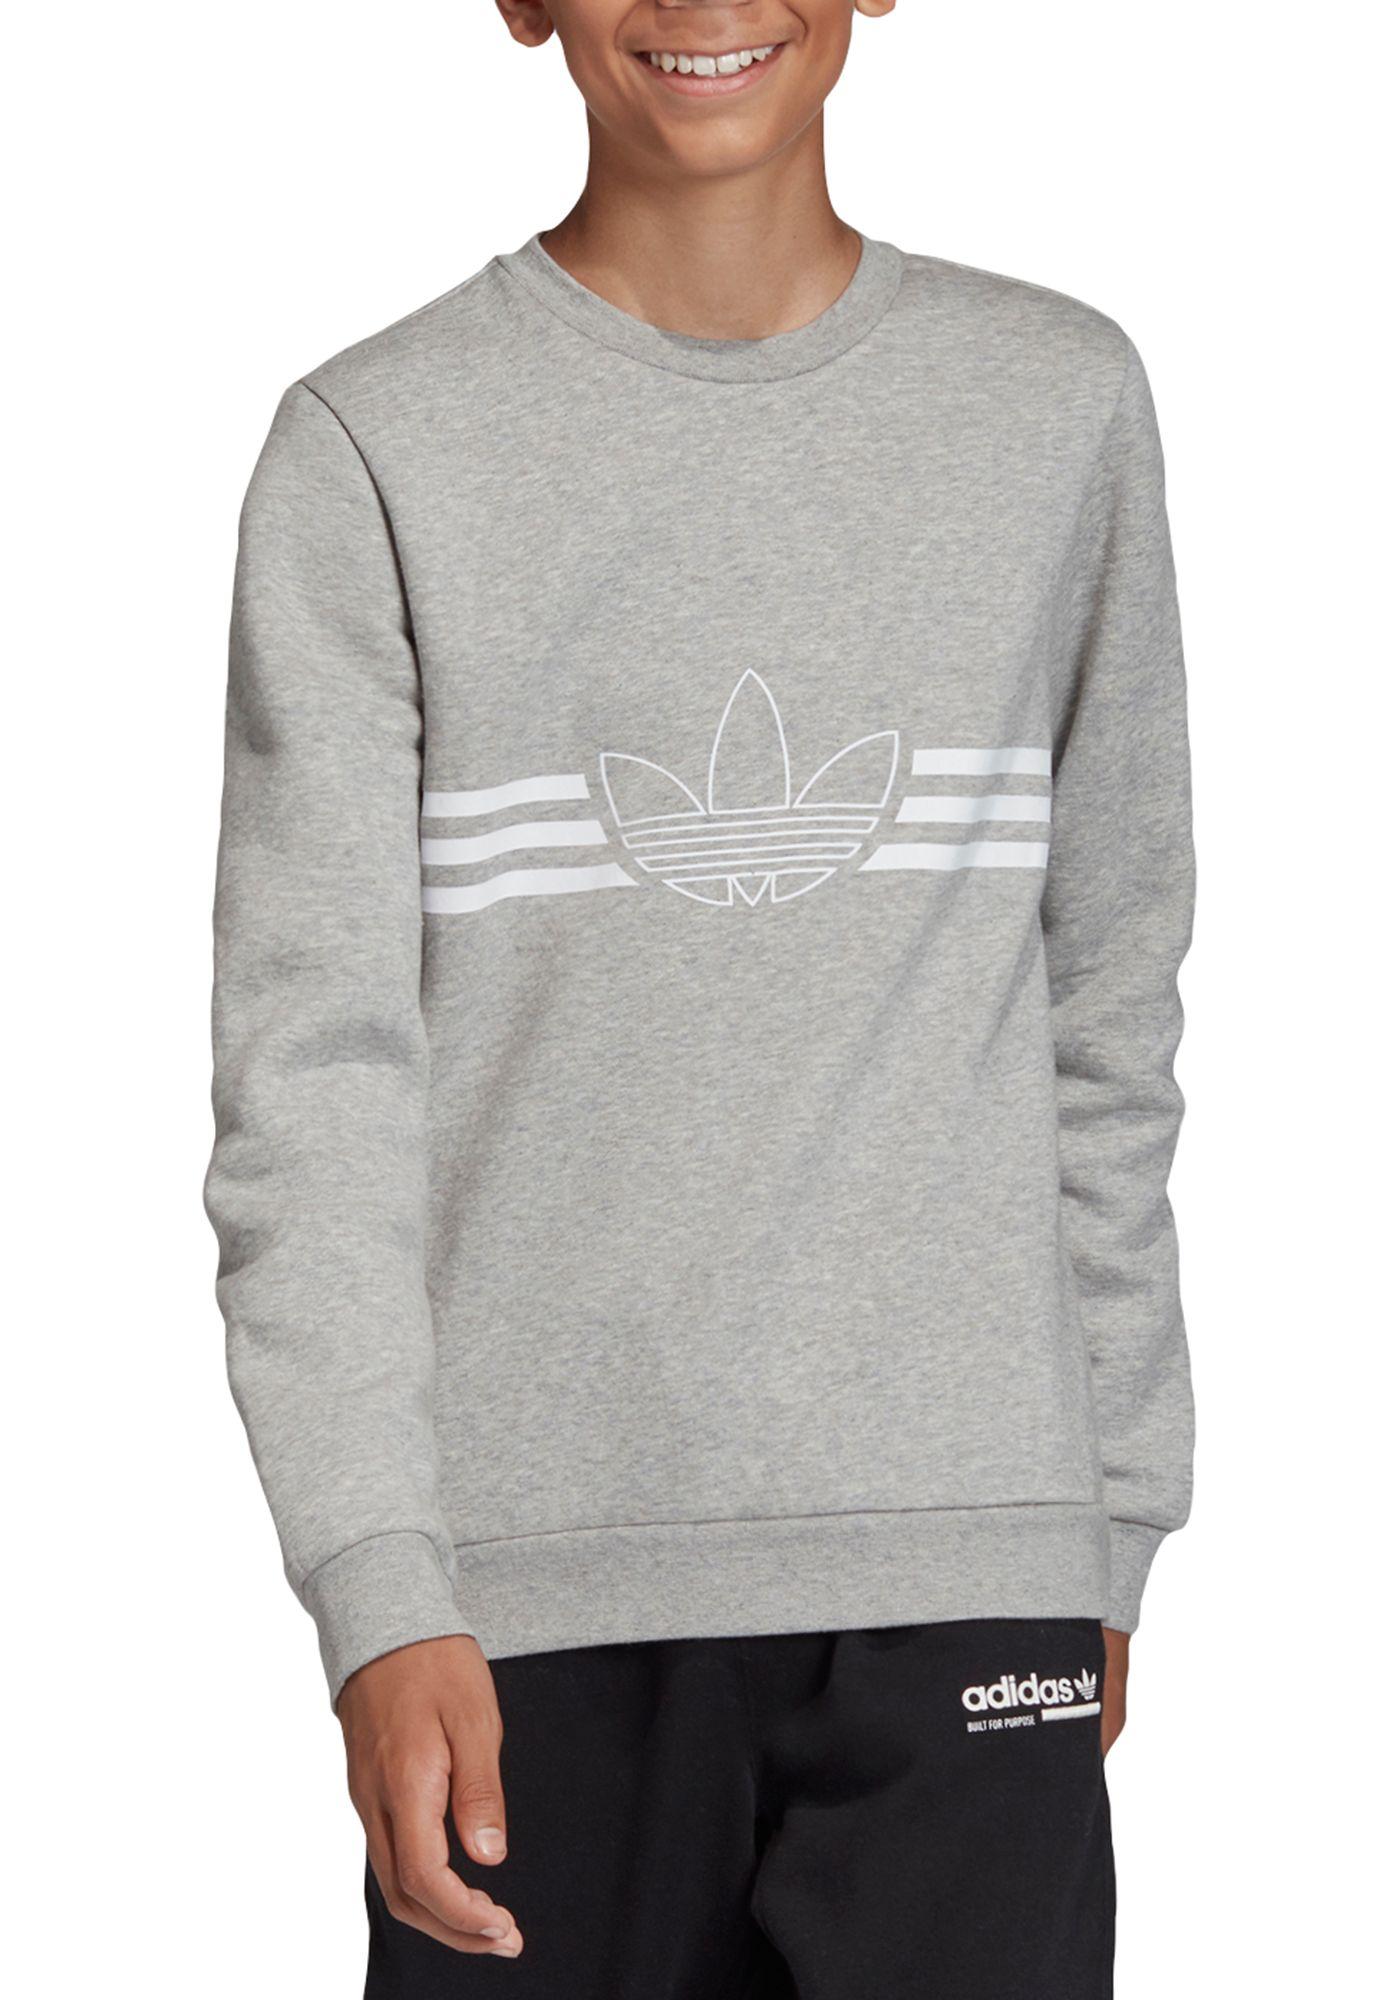 adidas Boy's Spirit Crewneck Sweatshirt